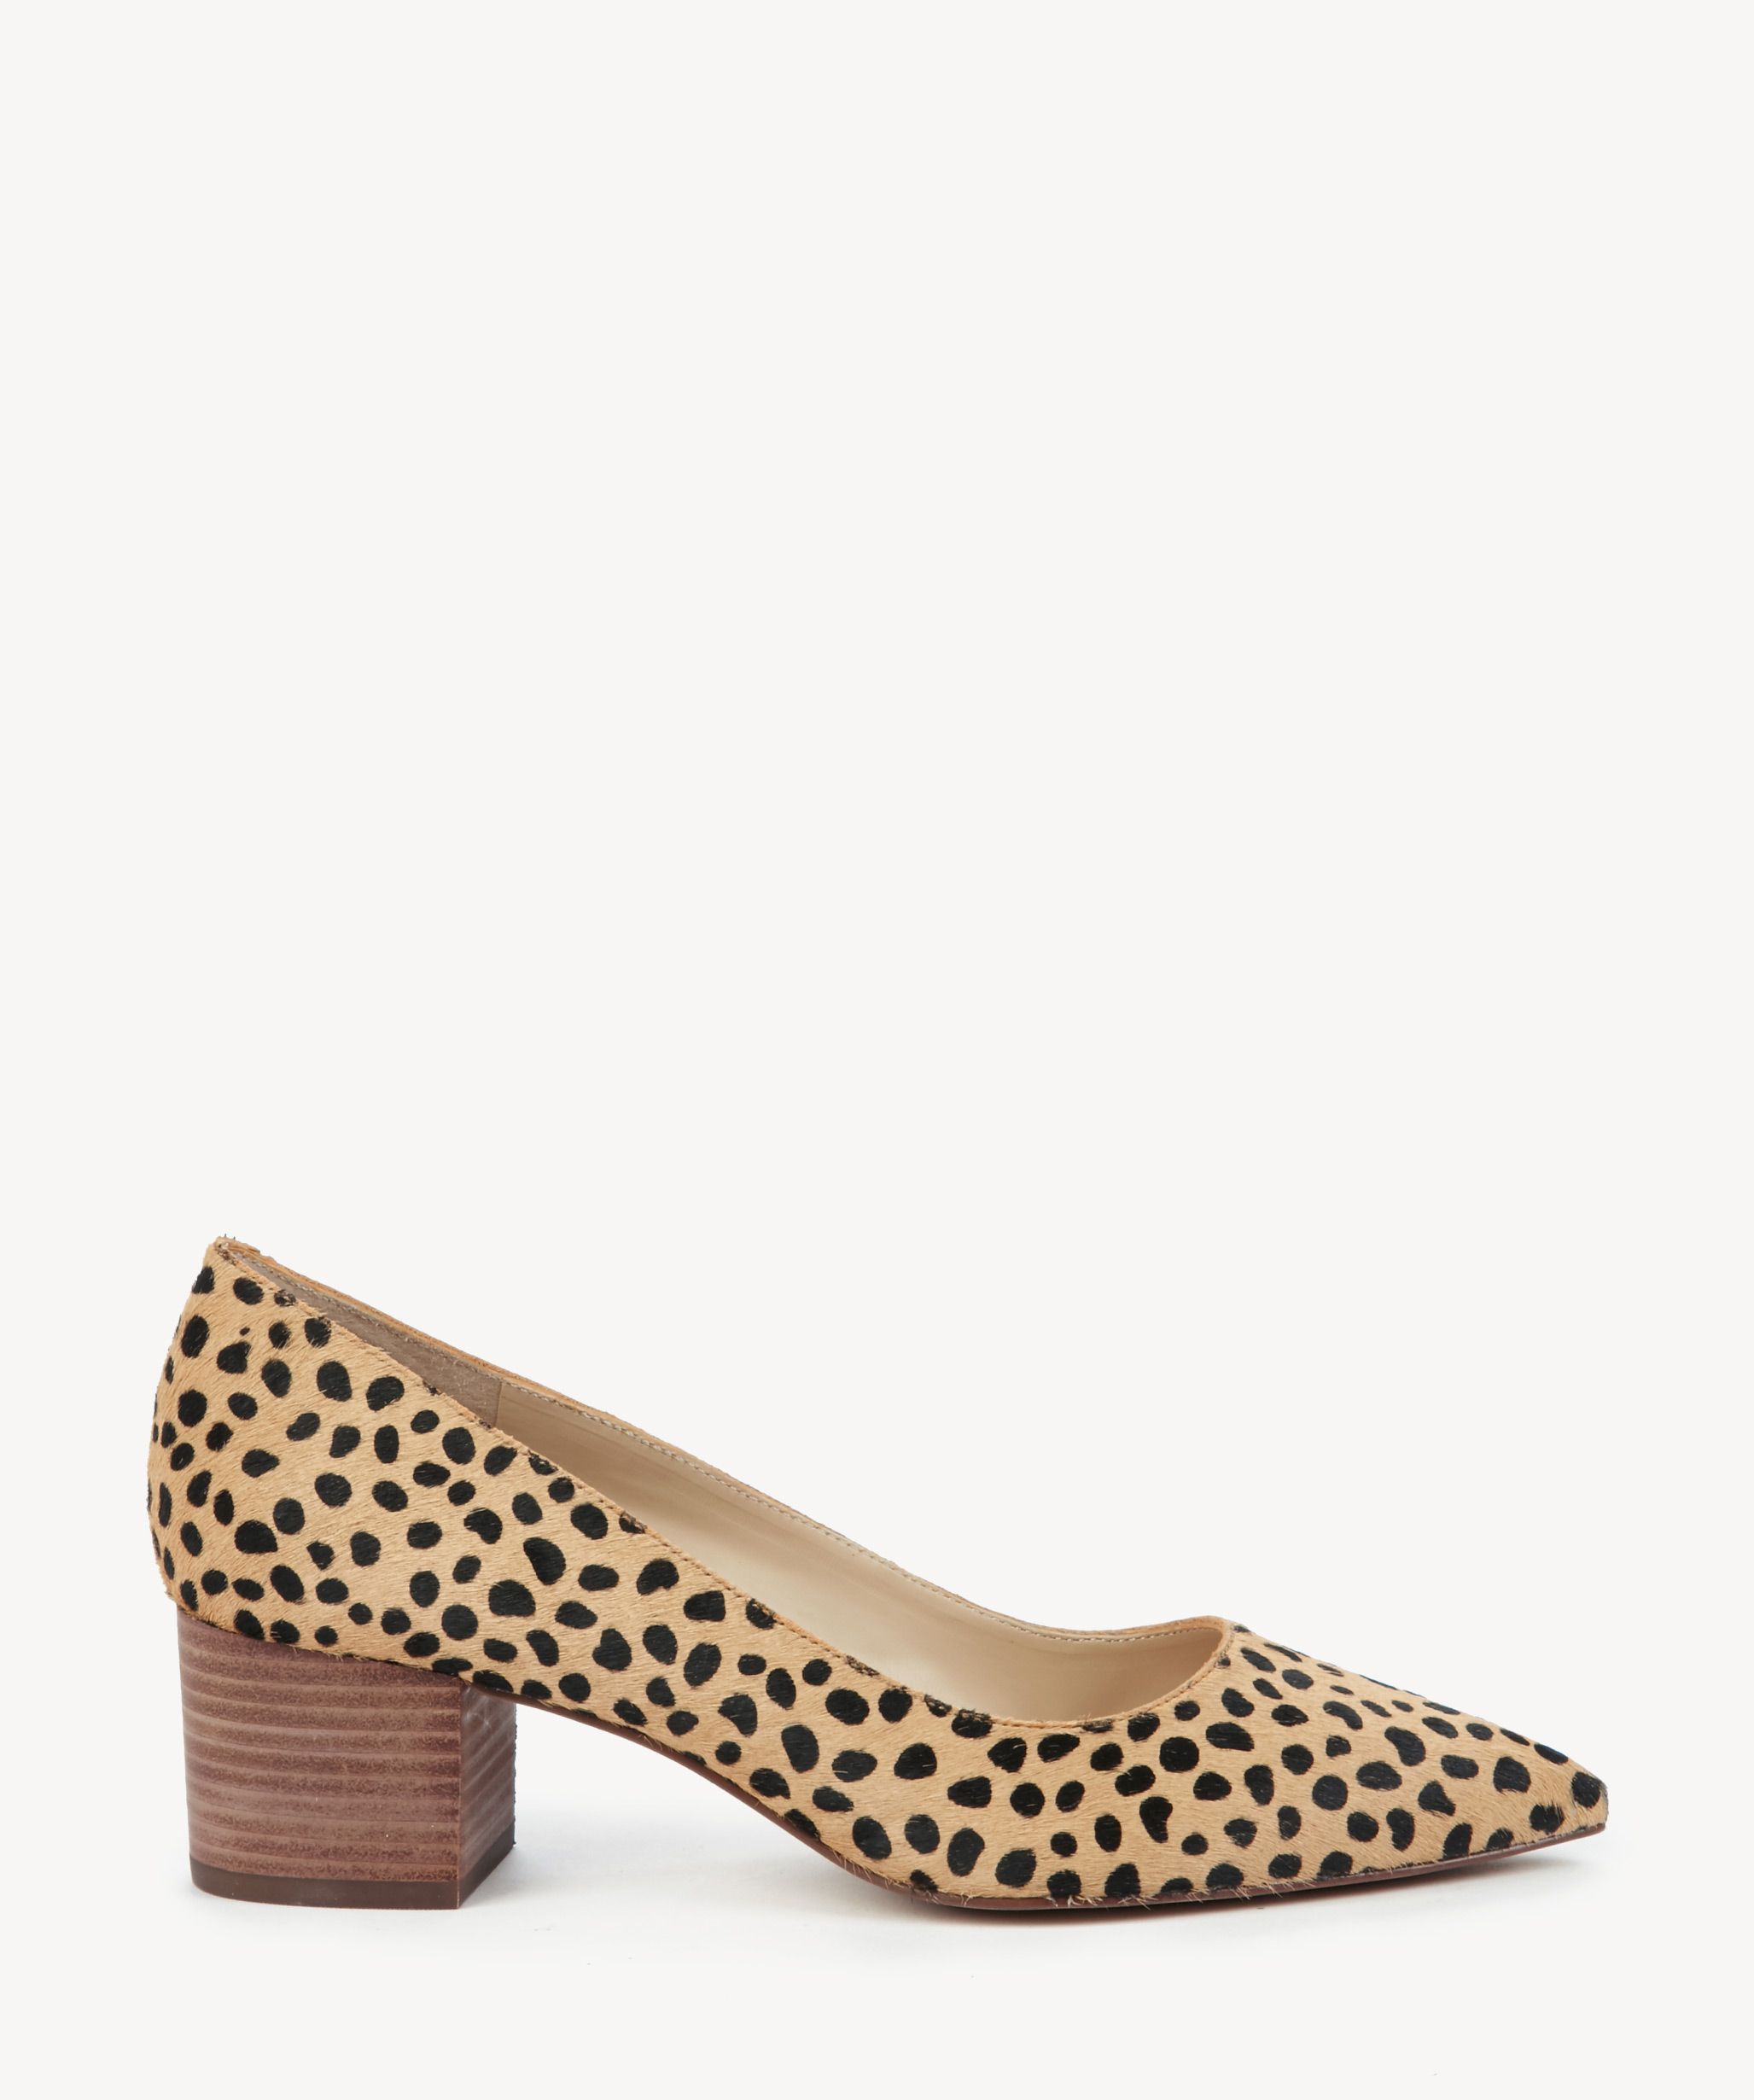 601e98bca9cf Sole Society Andorra Block Heels Pumps Cheetah Dot